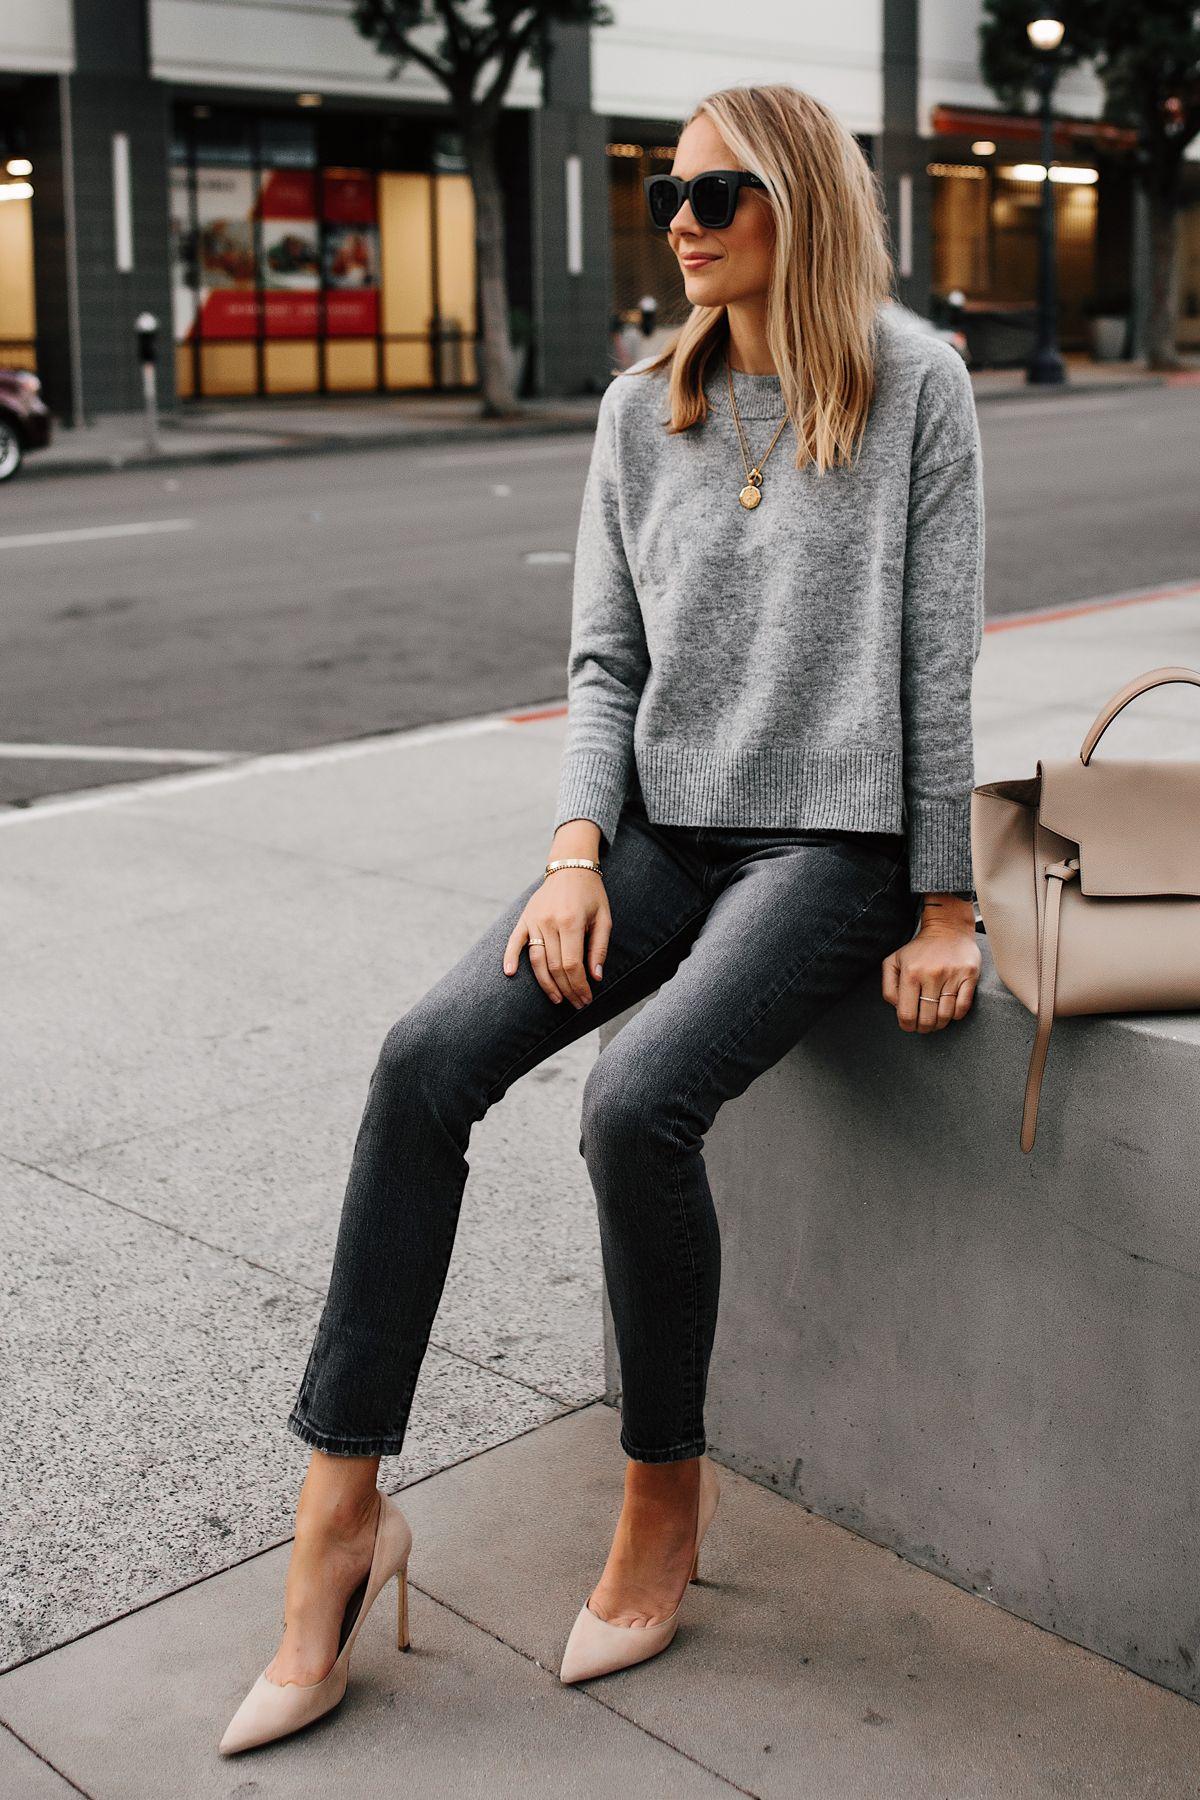 Blonde Woman Wearing Levis 501 Grey High Waist Skinny Jeans Grey Sweater Nude Pumps Fashion Jackson San Diego Fashion Blogger Street Style